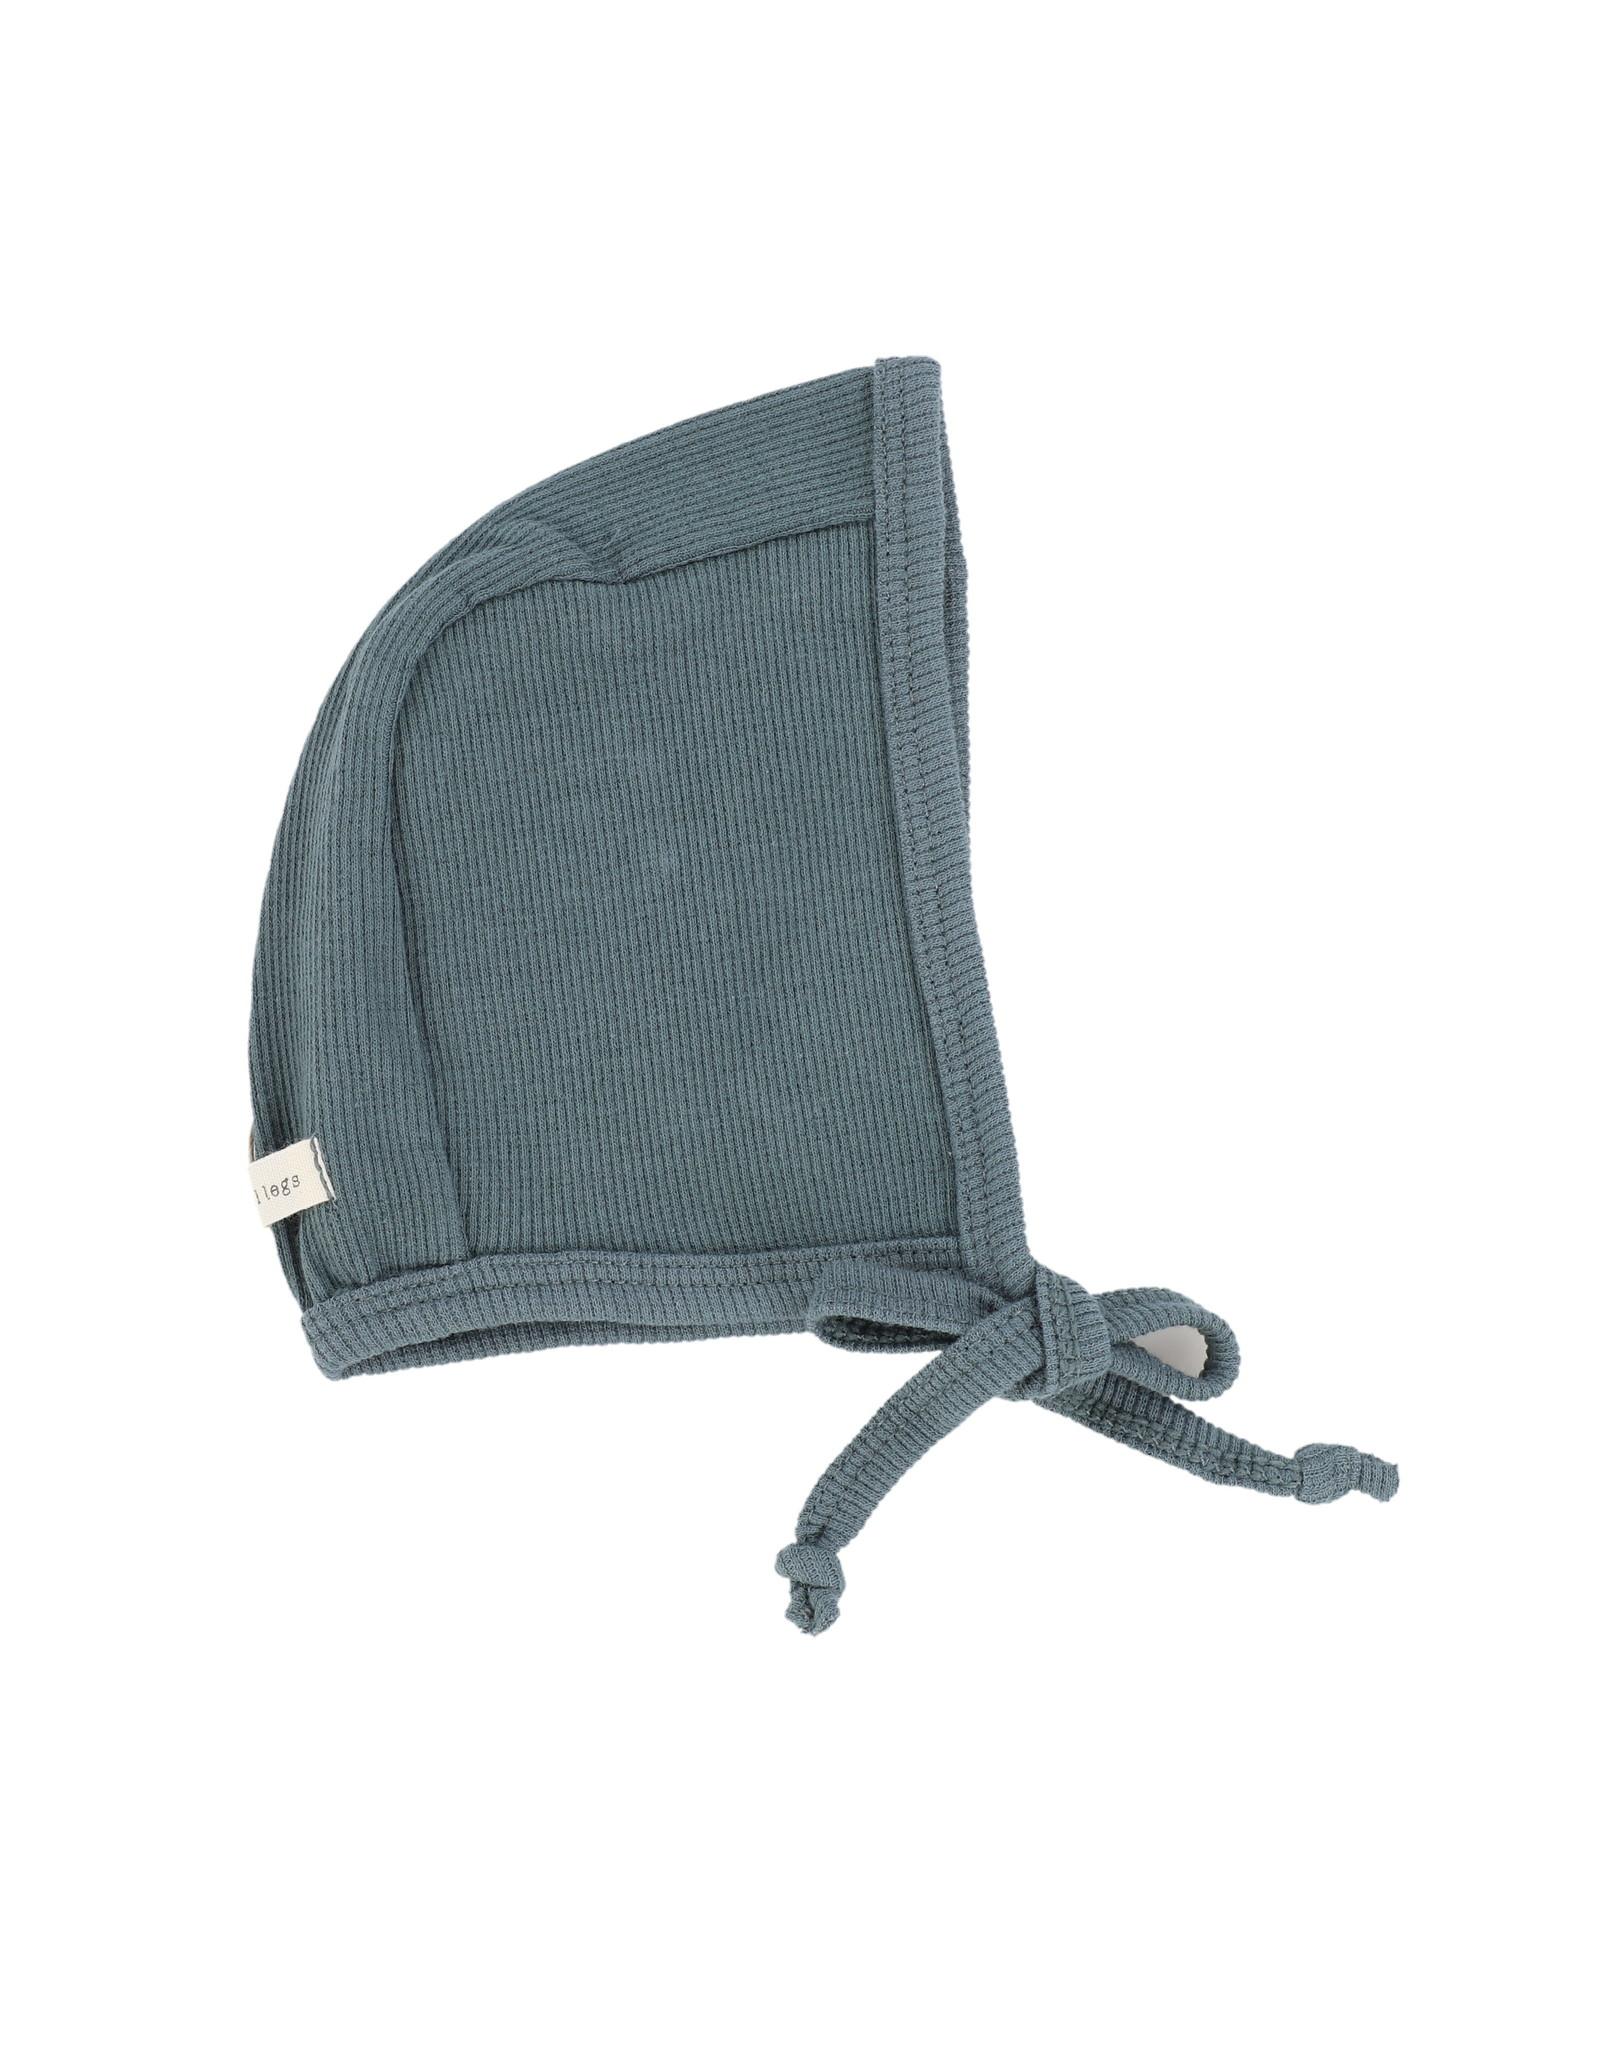 LIL LEGS FW21 Classic Ribbed Bonnet